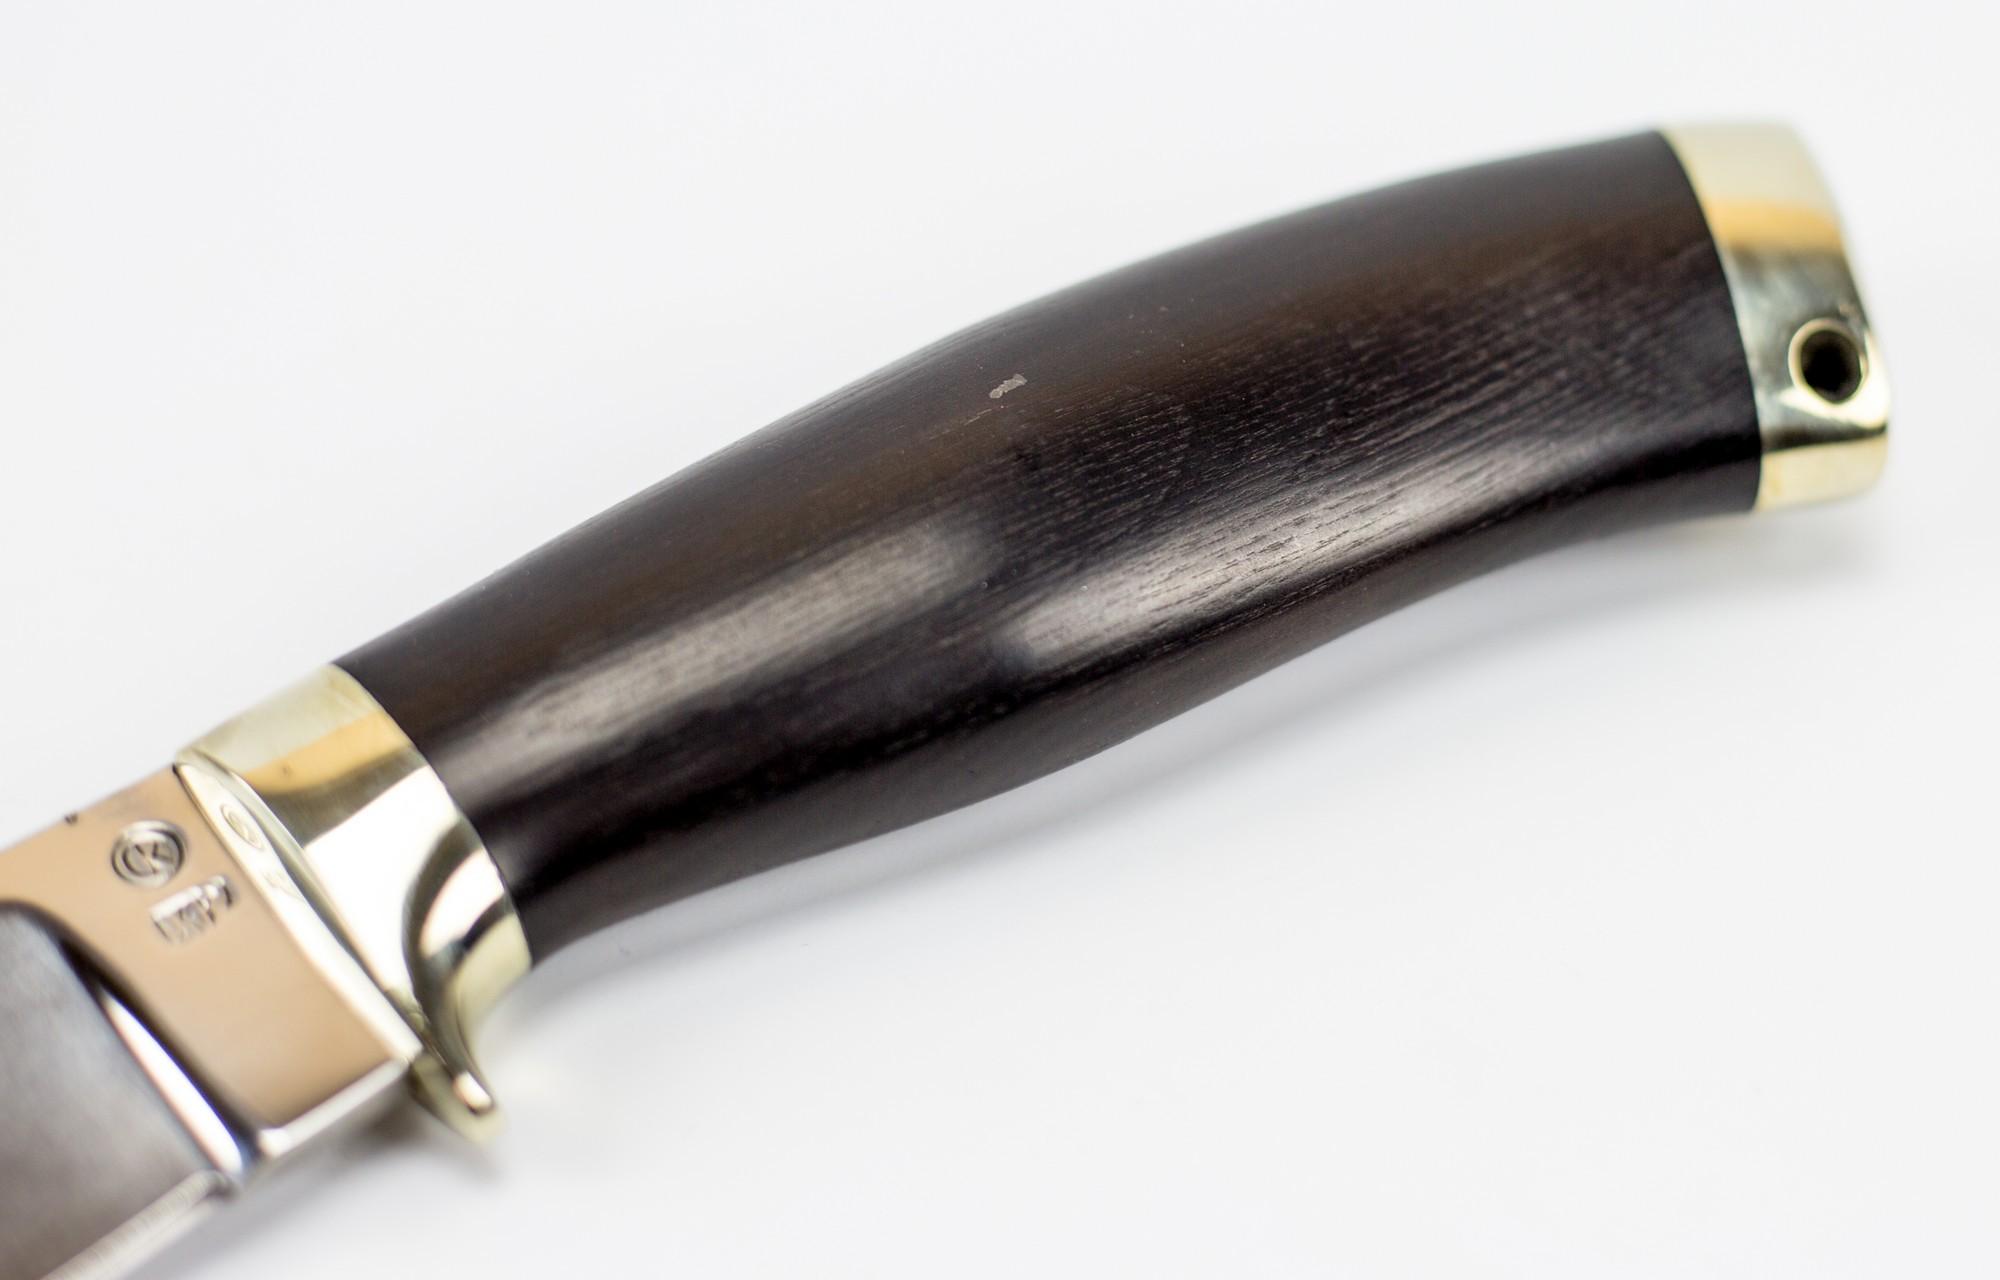 Фото 6 - Нож Лесник, сталь Х12МФ от Ножи Крутова